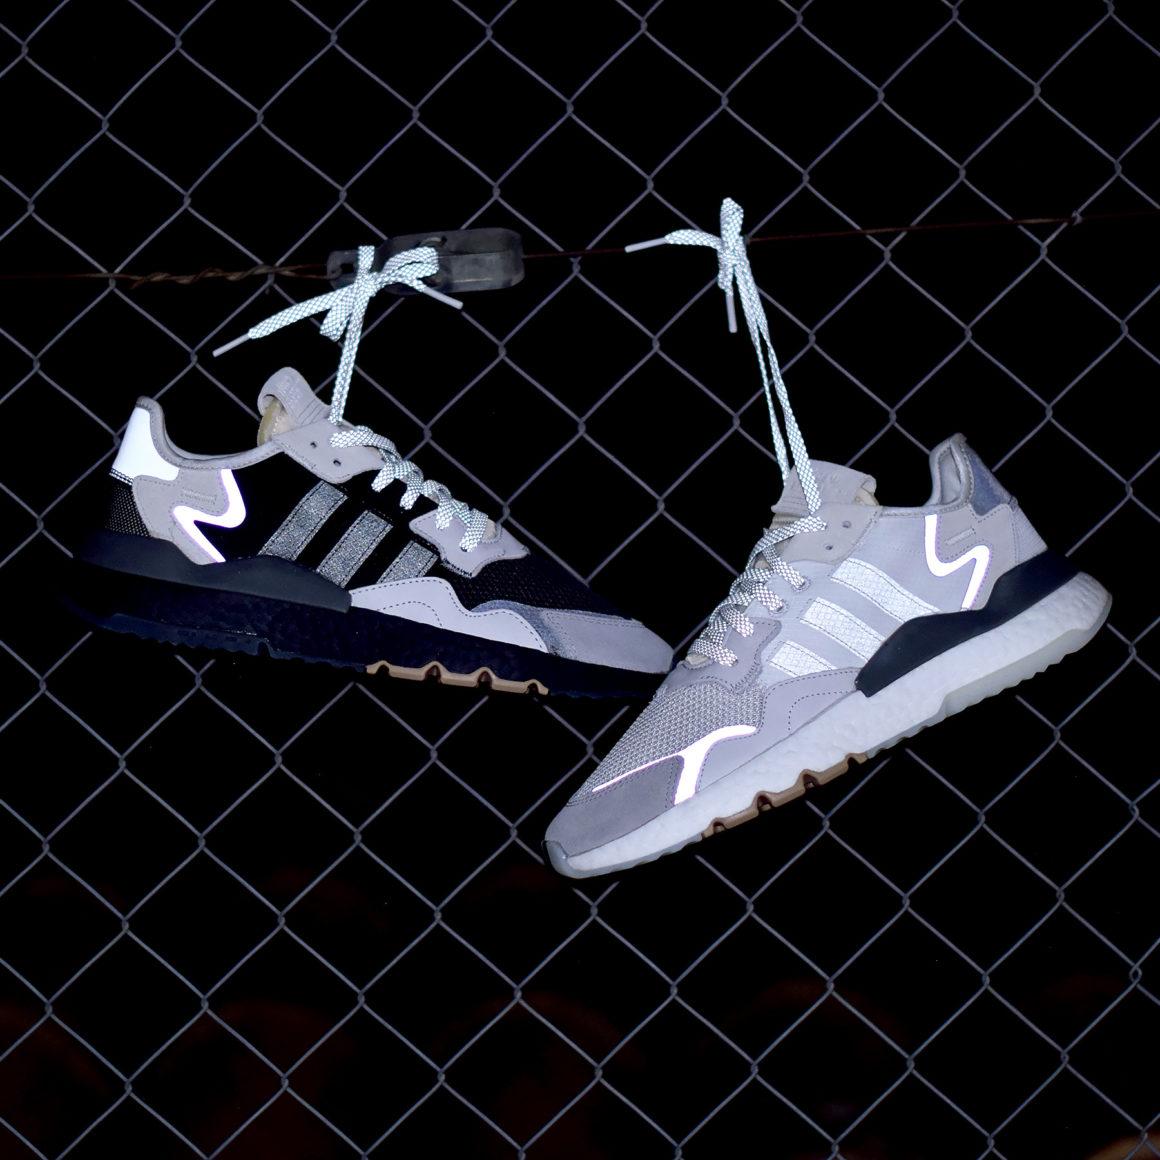 adidas-nite-jogger-black-white-01